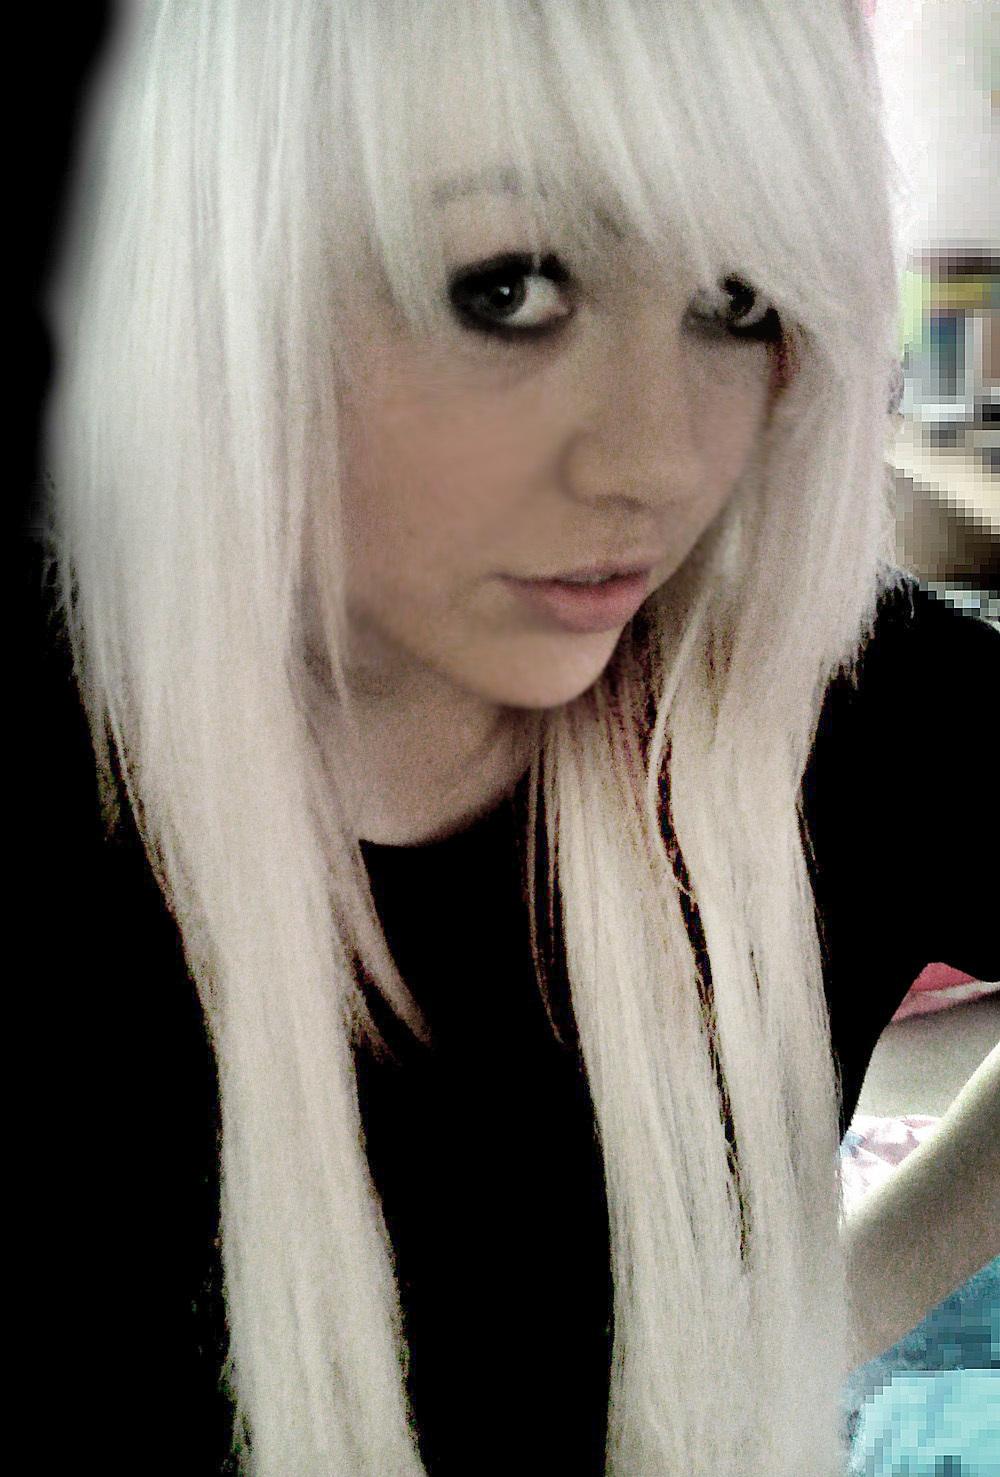 Emo scene hairstyles michelle nique scene girl